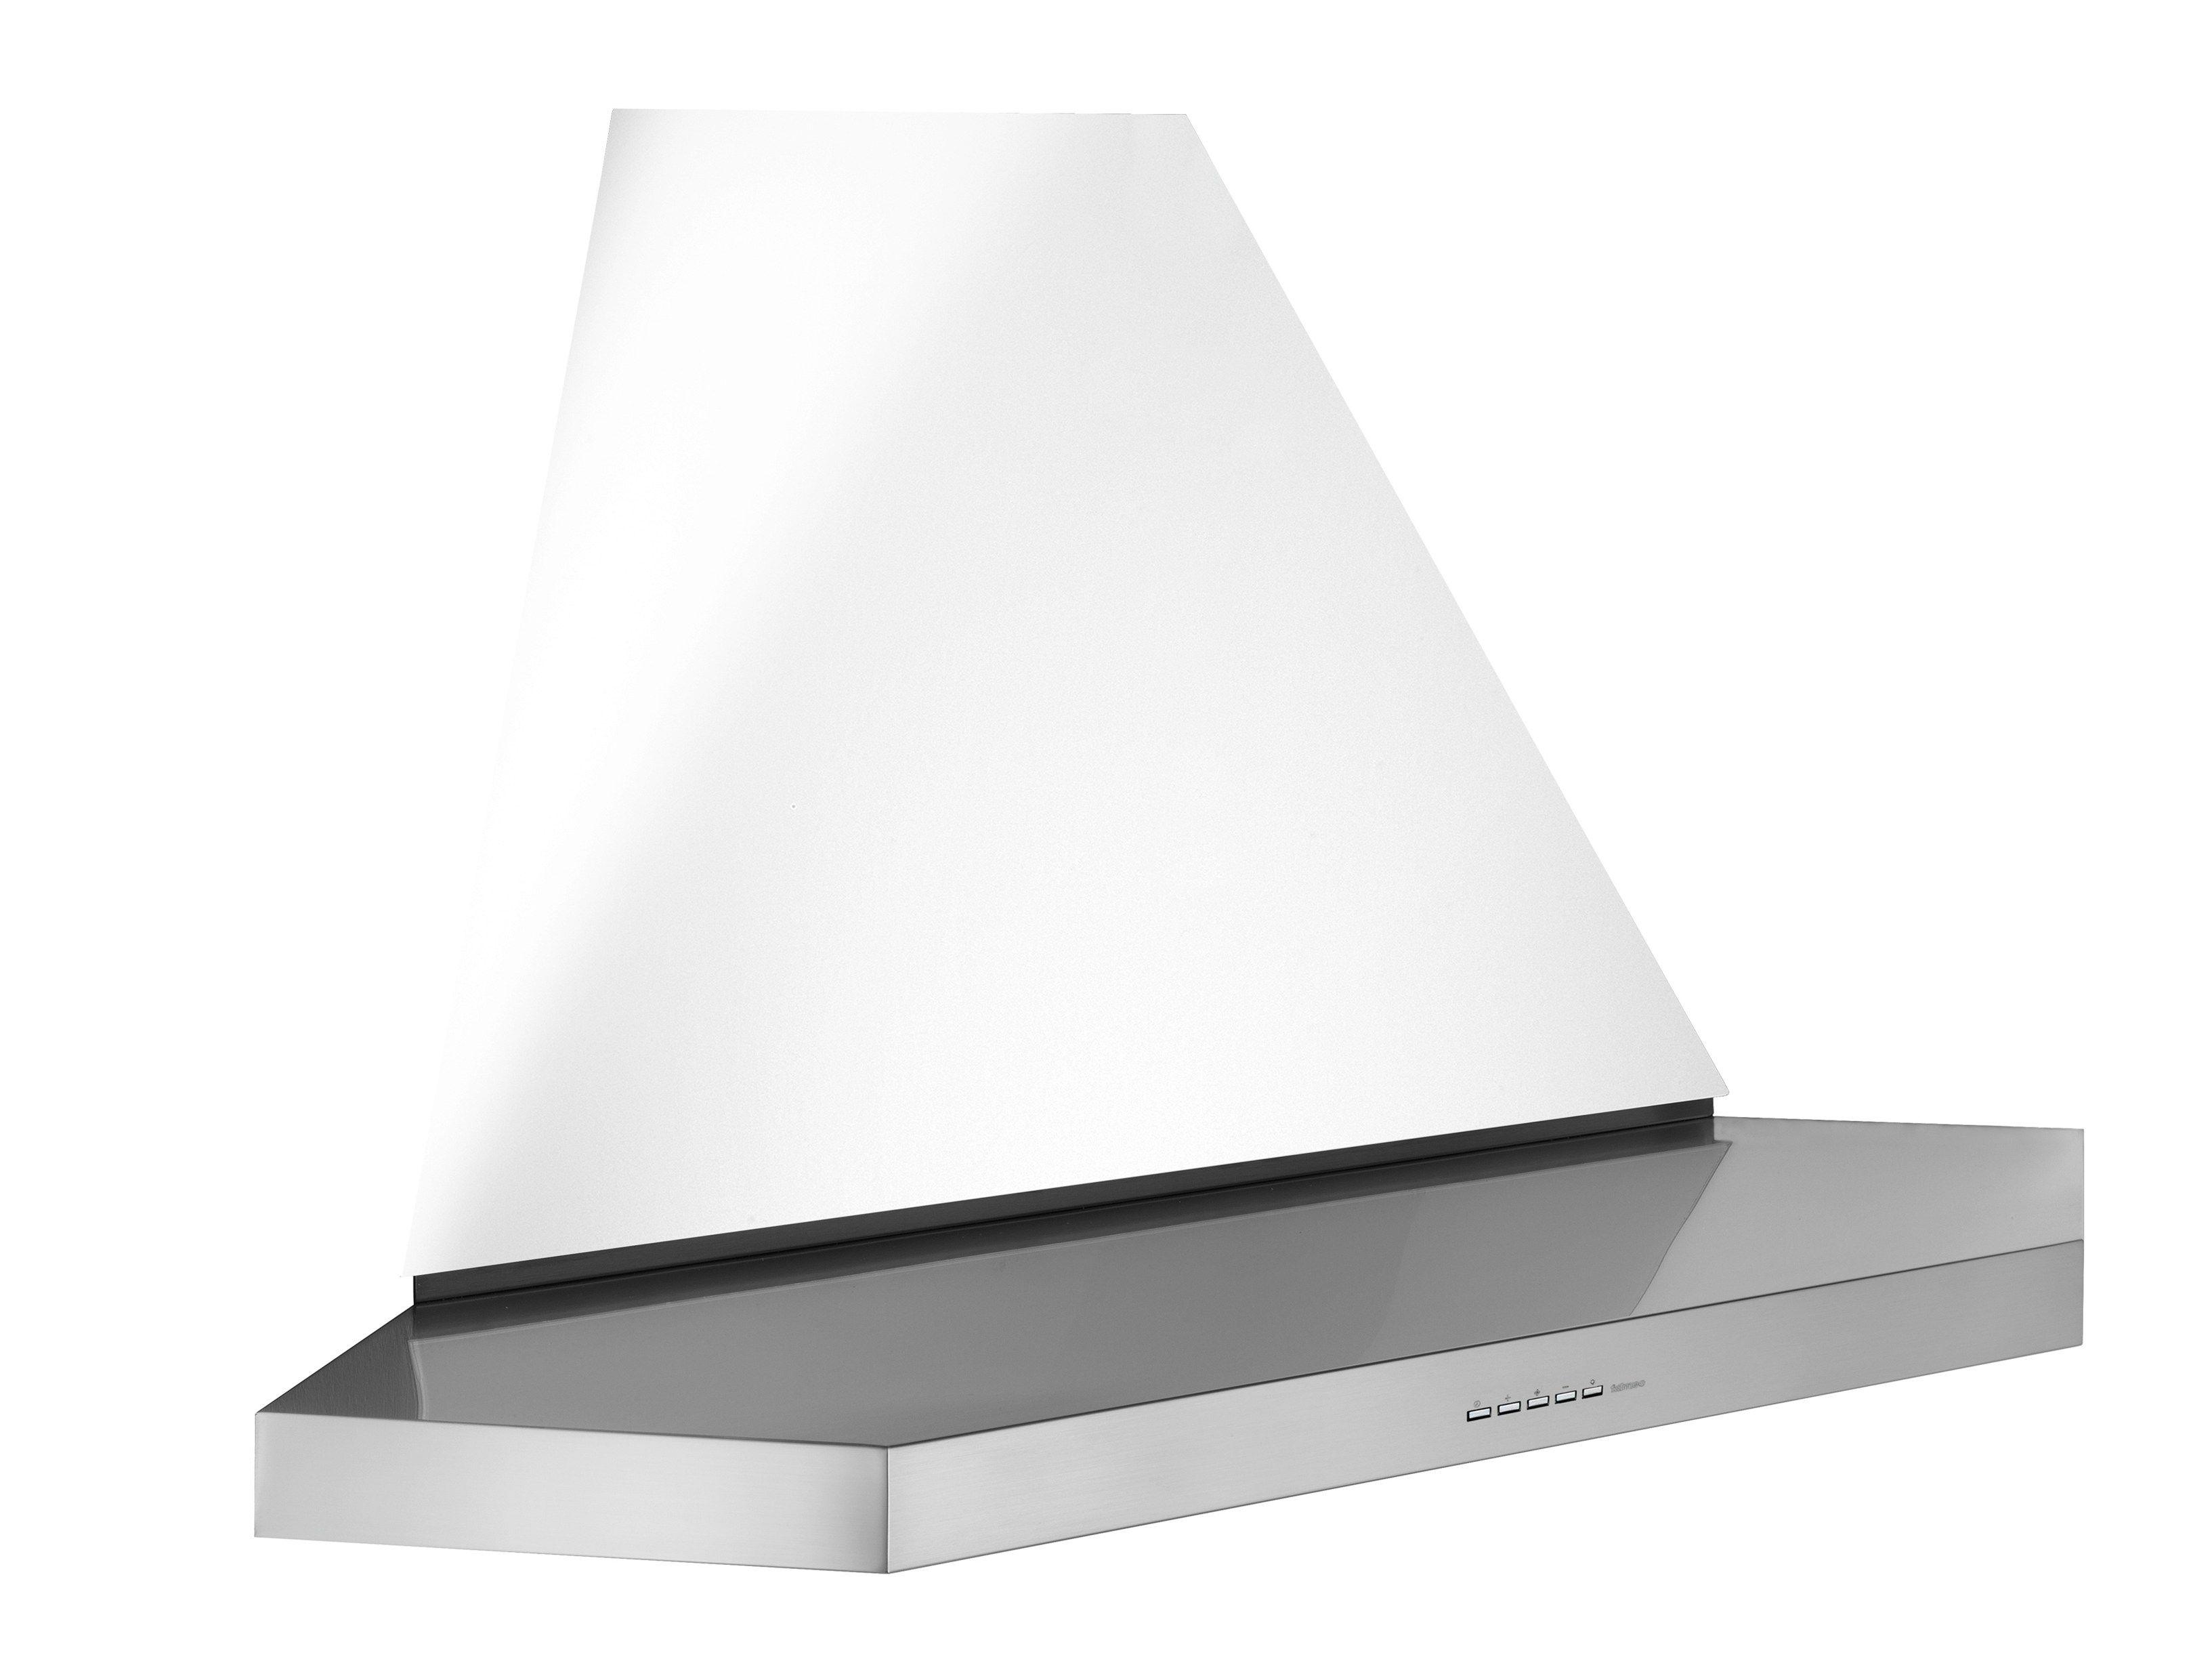 eck dunstabzugshaube aus edelstahl mit integrierter beleuchtung angolo plane kollektion design. Black Bedroom Furniture Sets. Home Design Ideas